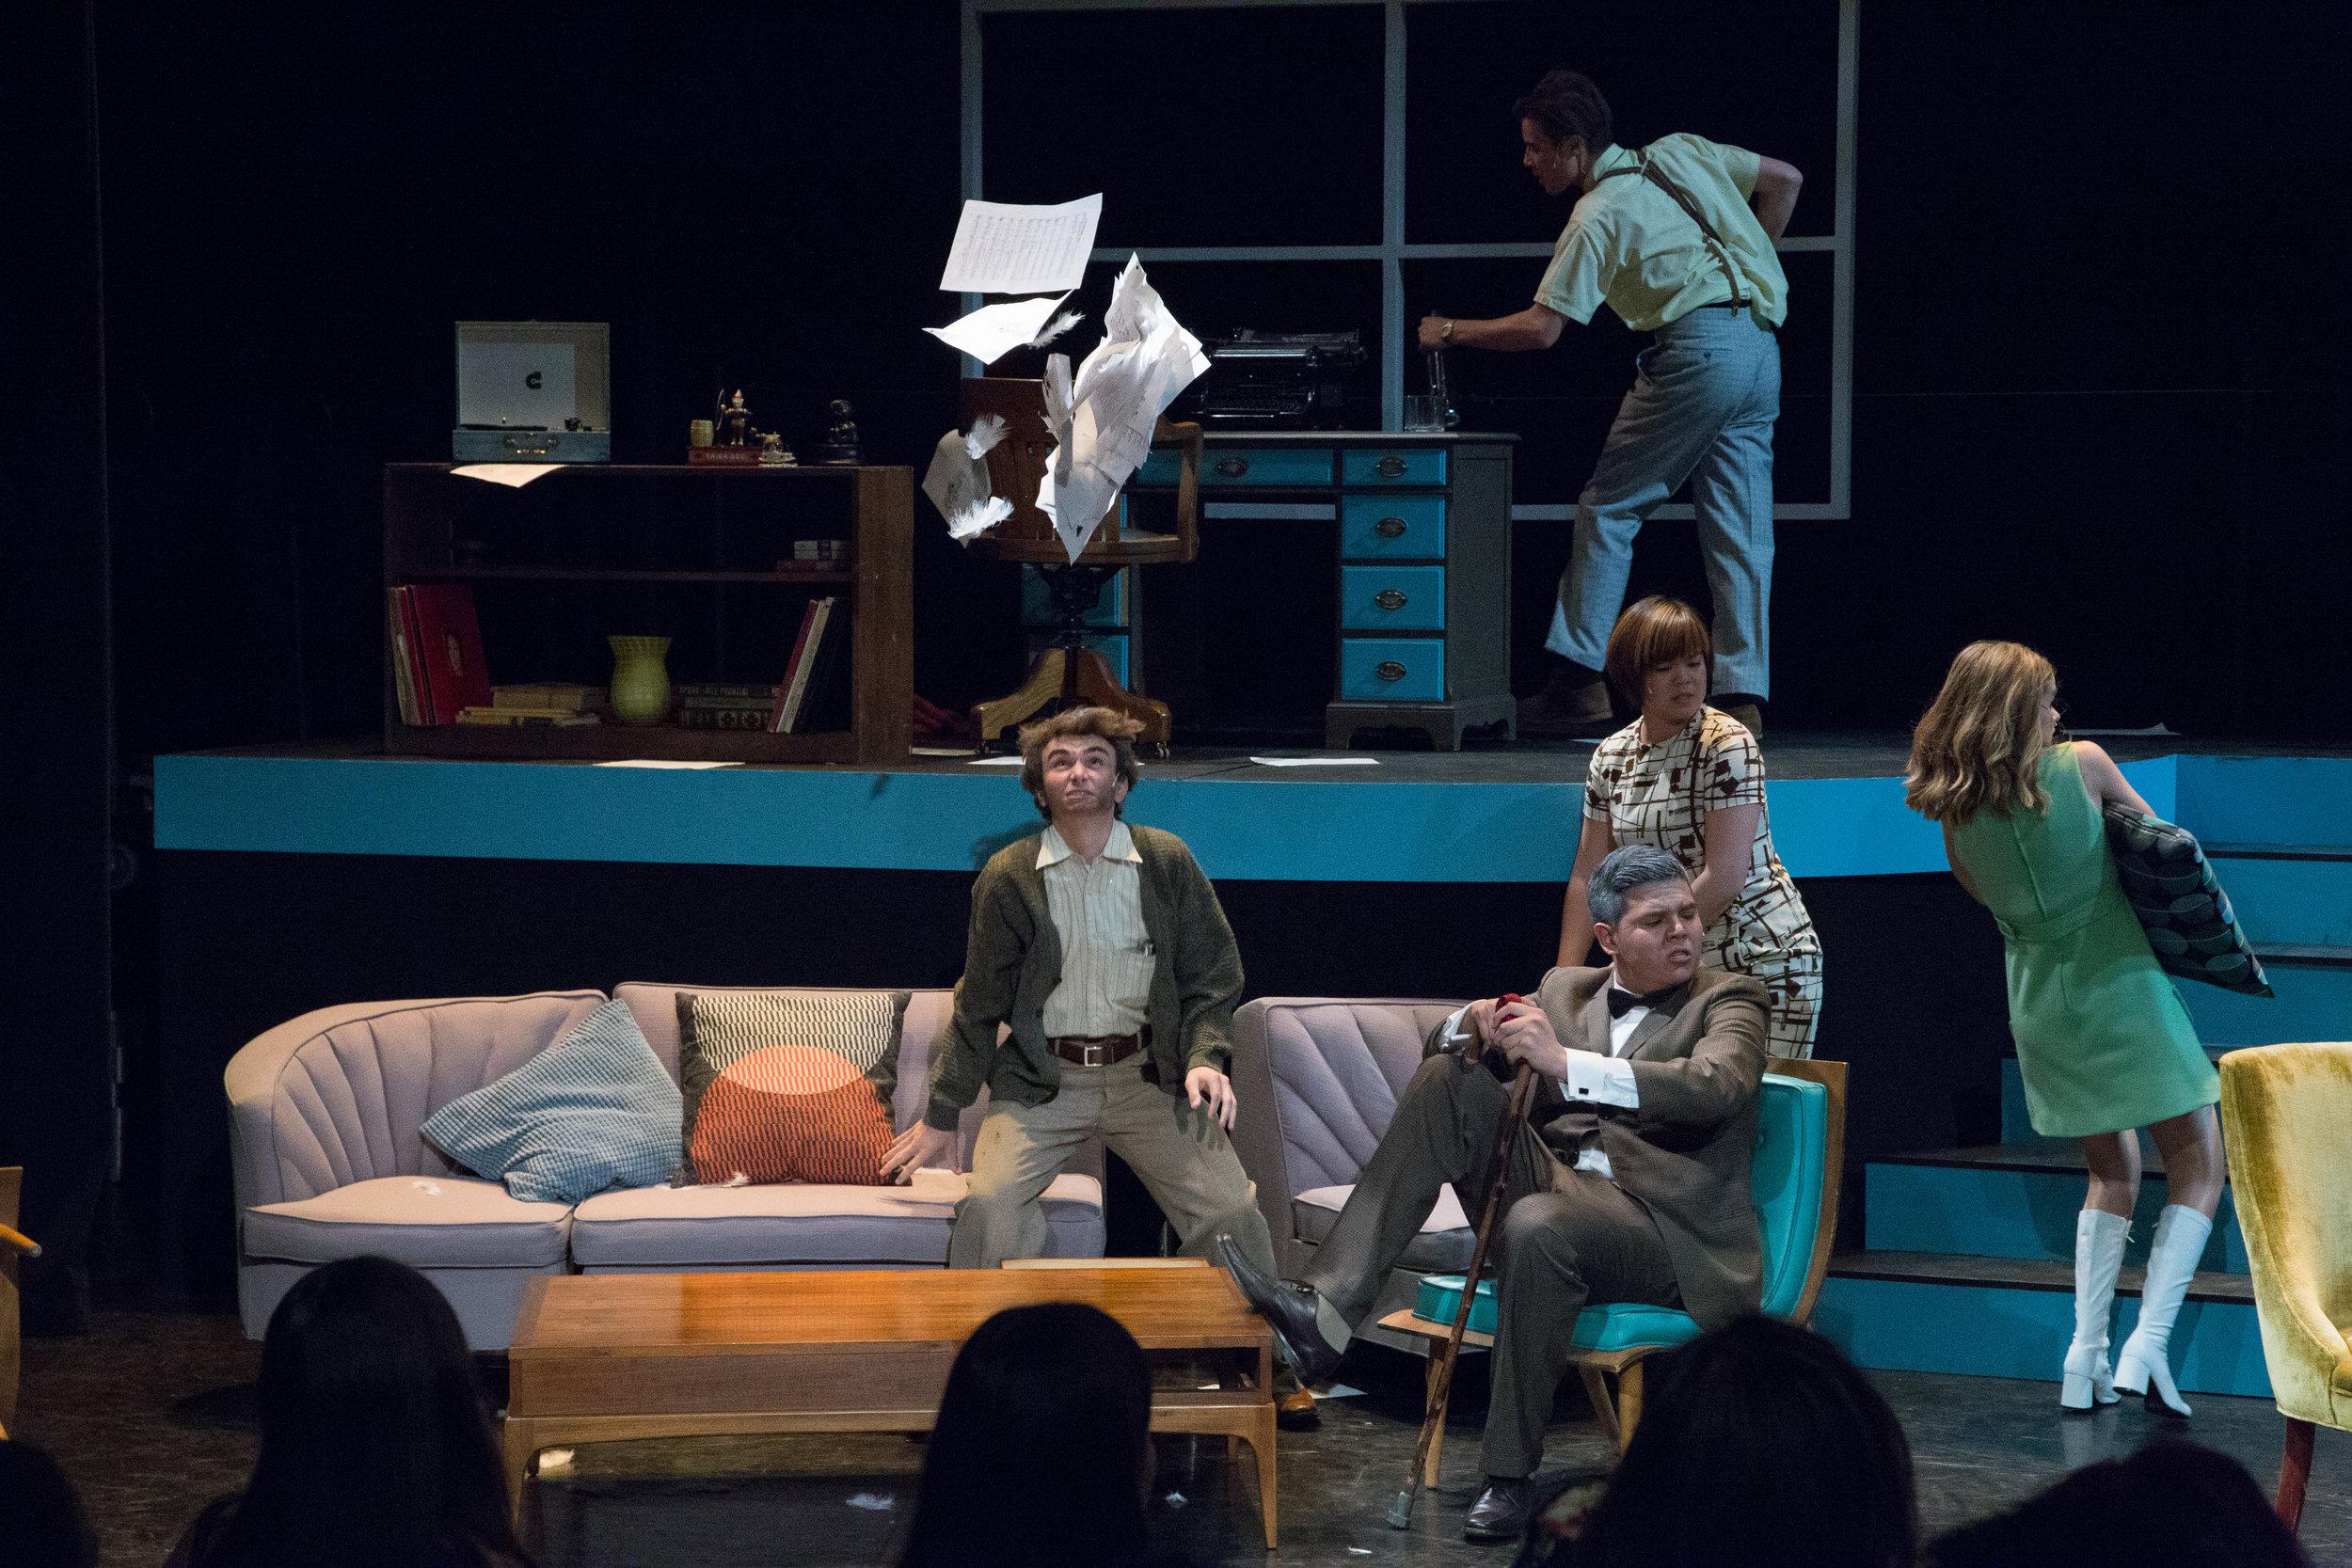 Night At The Opera/G. Schicci